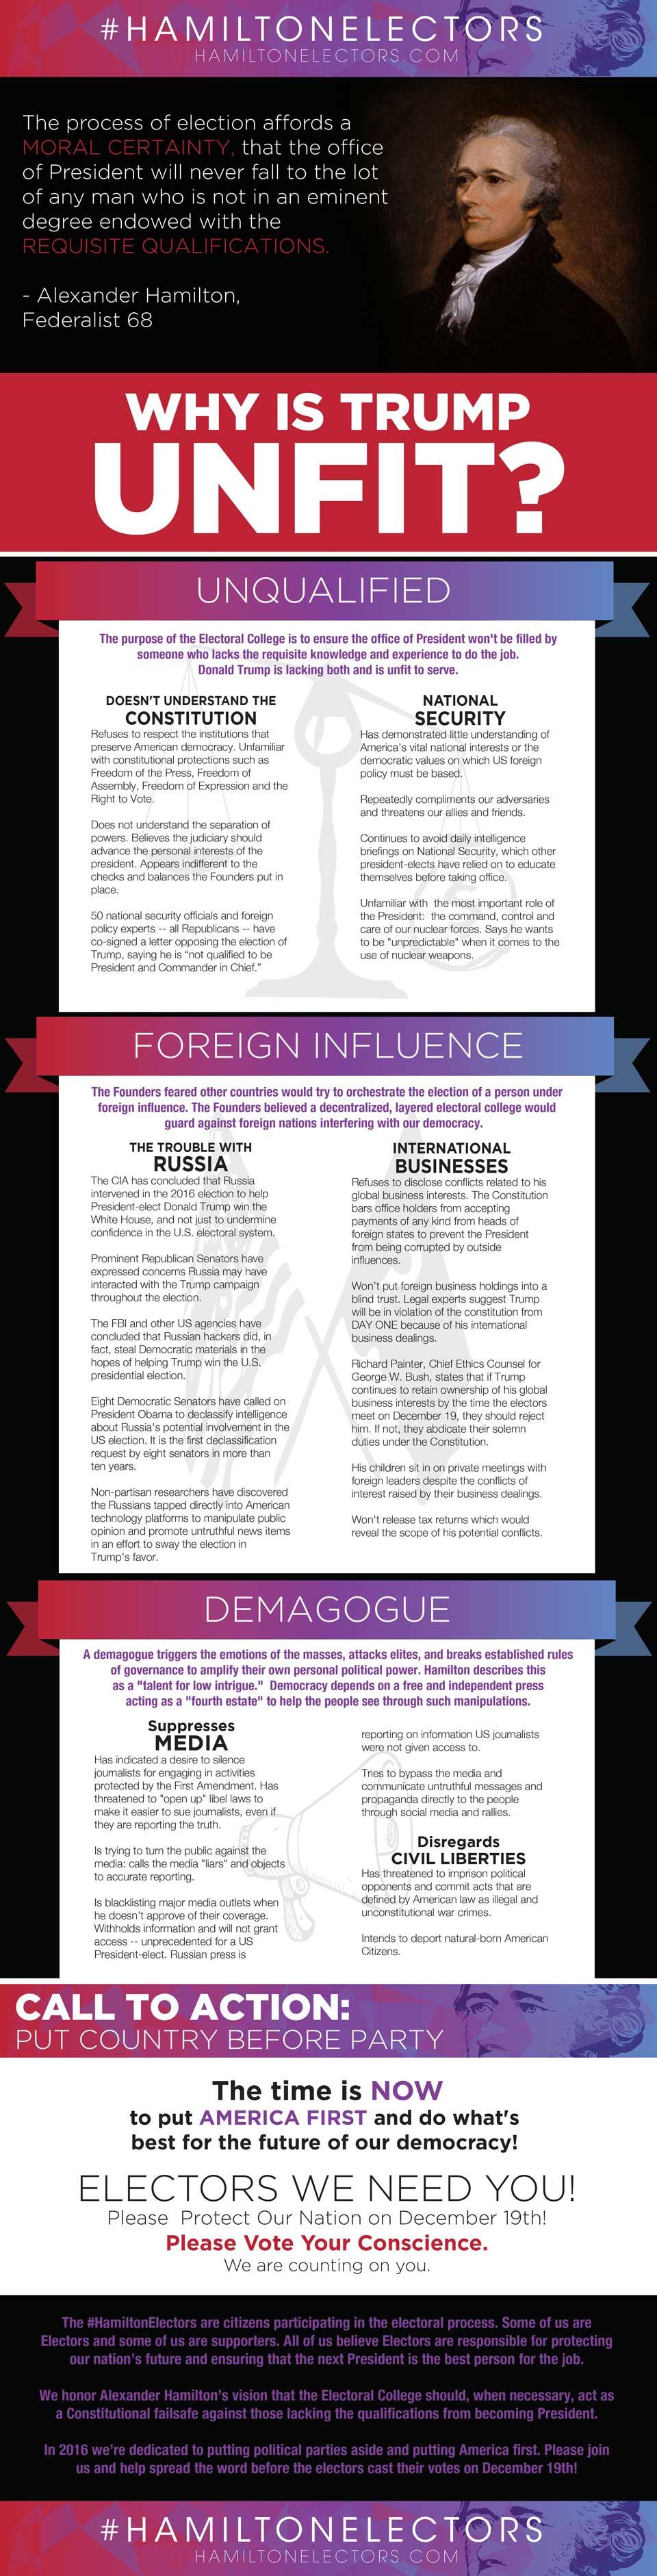 hamilton-elector-infographic-01.jpg